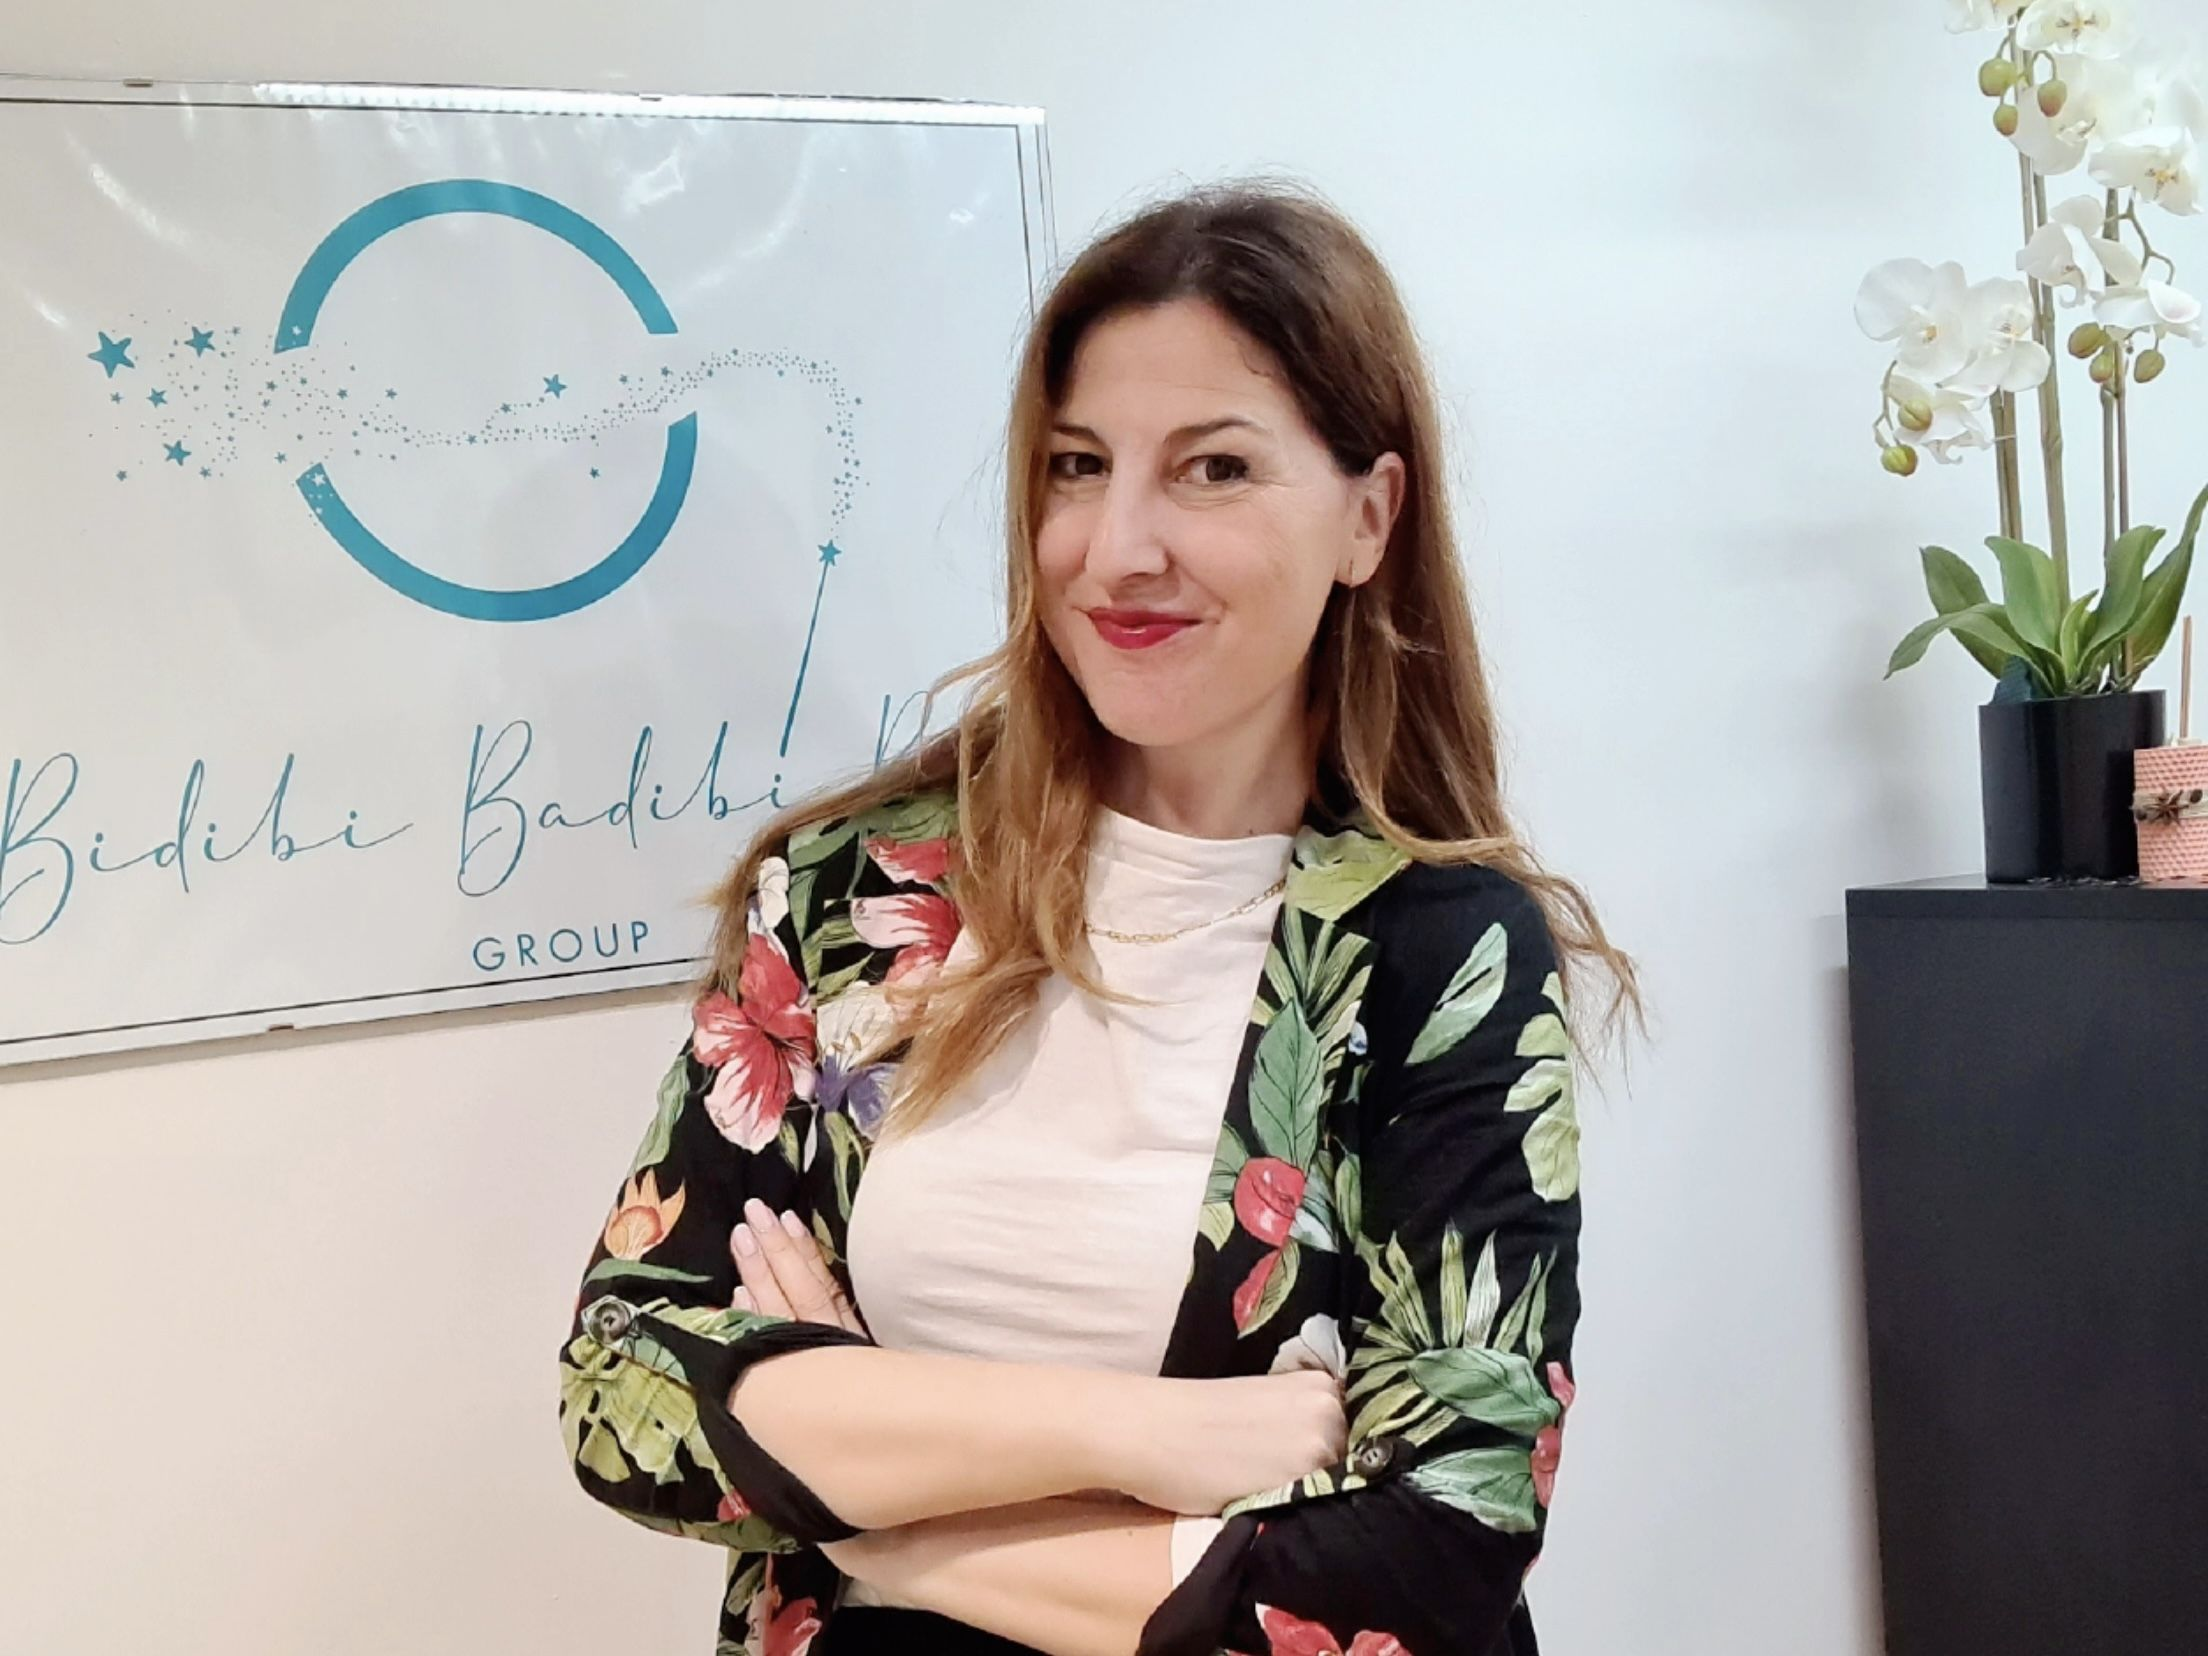 """Bidibi Badibi Bú Group"" revoluciona el marketing de influencers apostando por el talento emergente real"